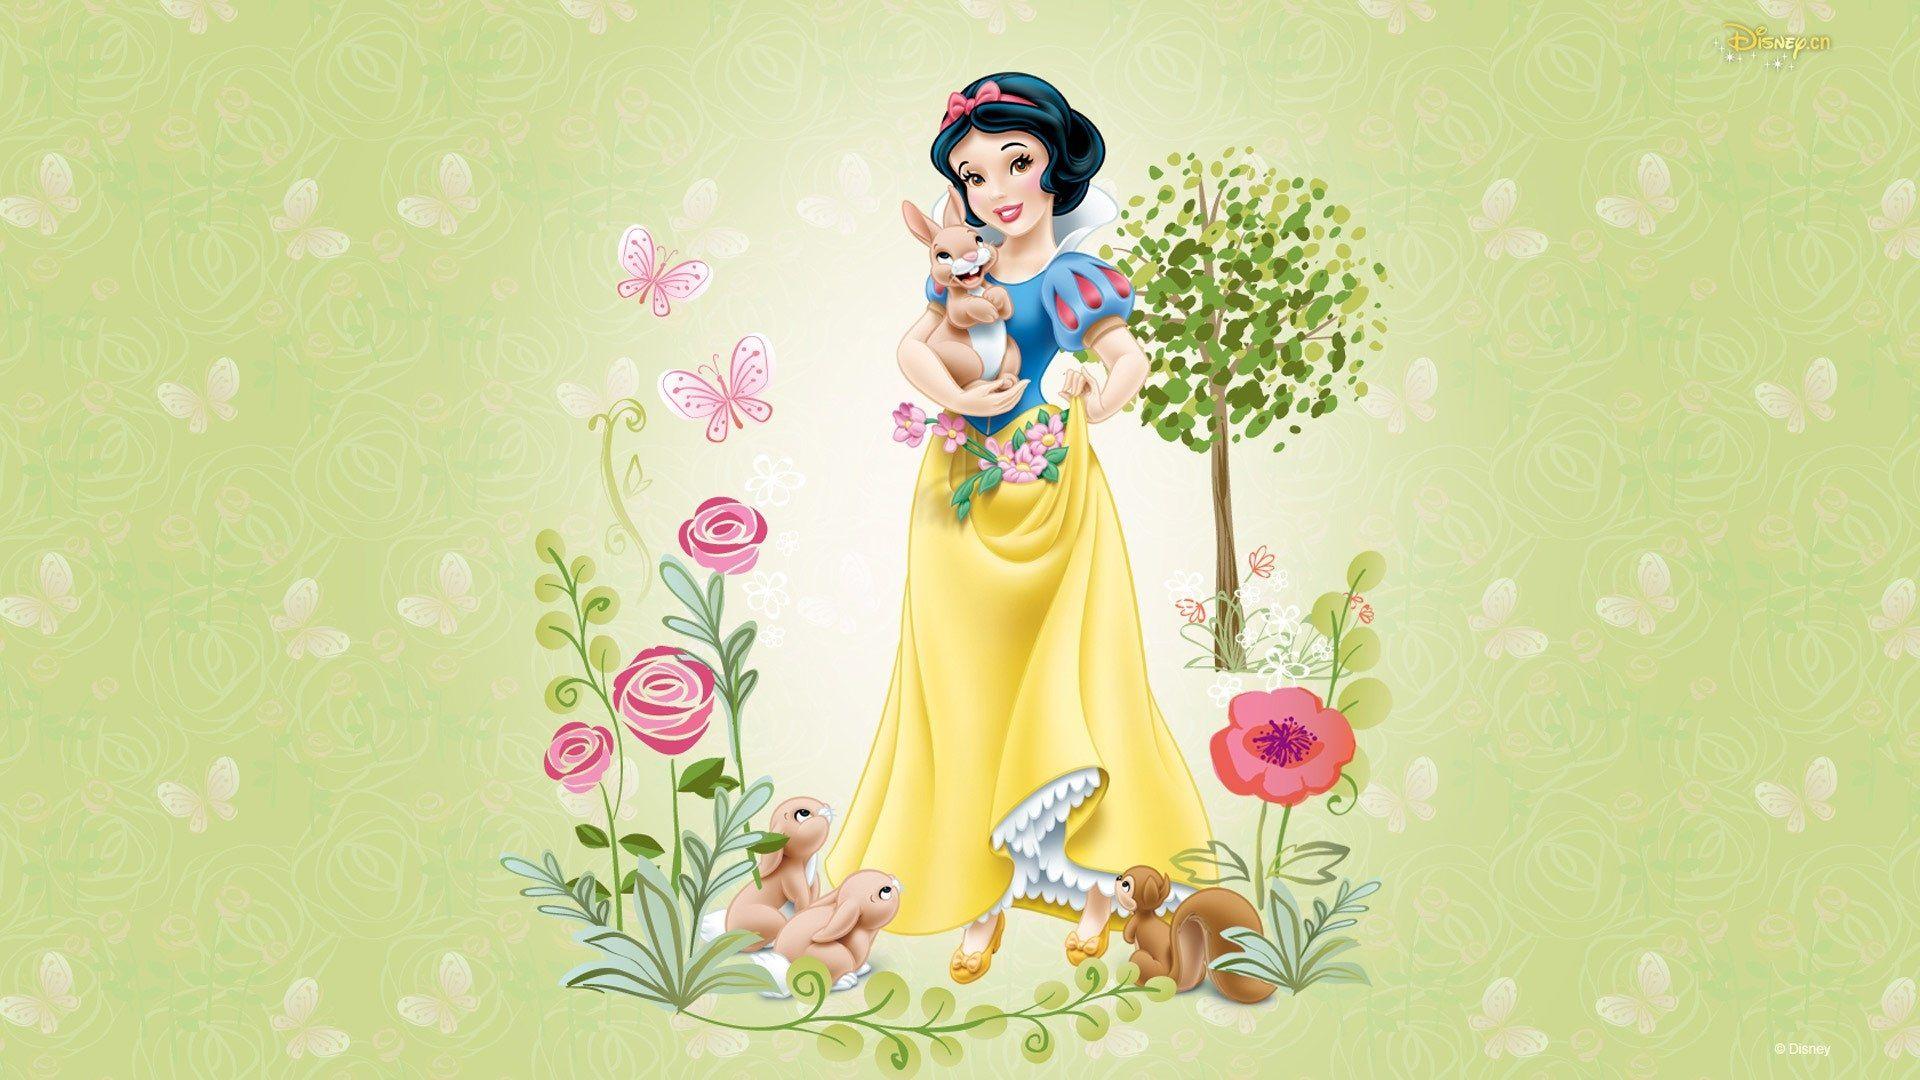 1920x1080 Snow White Hr Wallpaper Disney Princess Snow White Snow White Wallpaper Snow White Movie